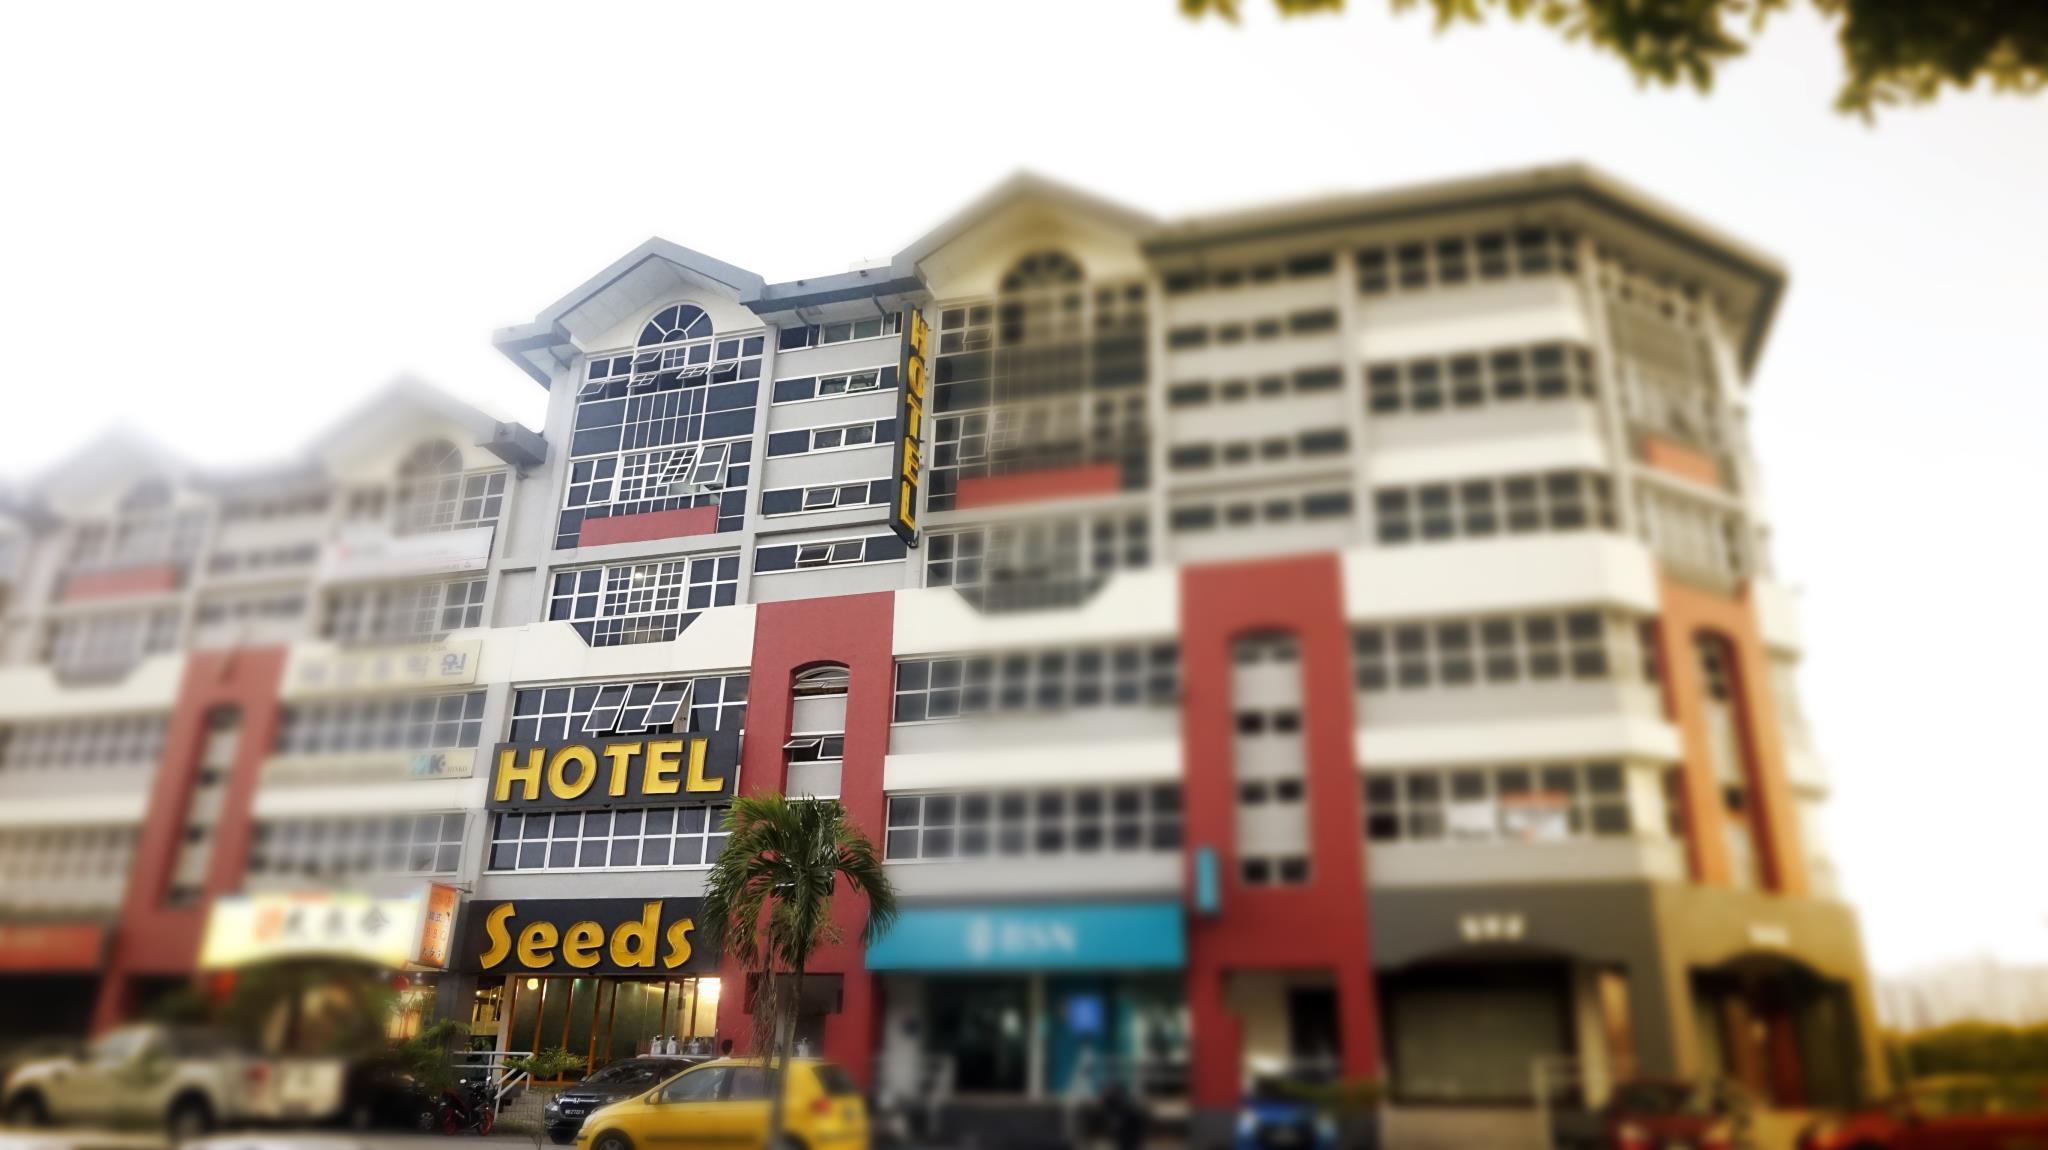 Seeds Hotel Ampang Point, Hulu Langat